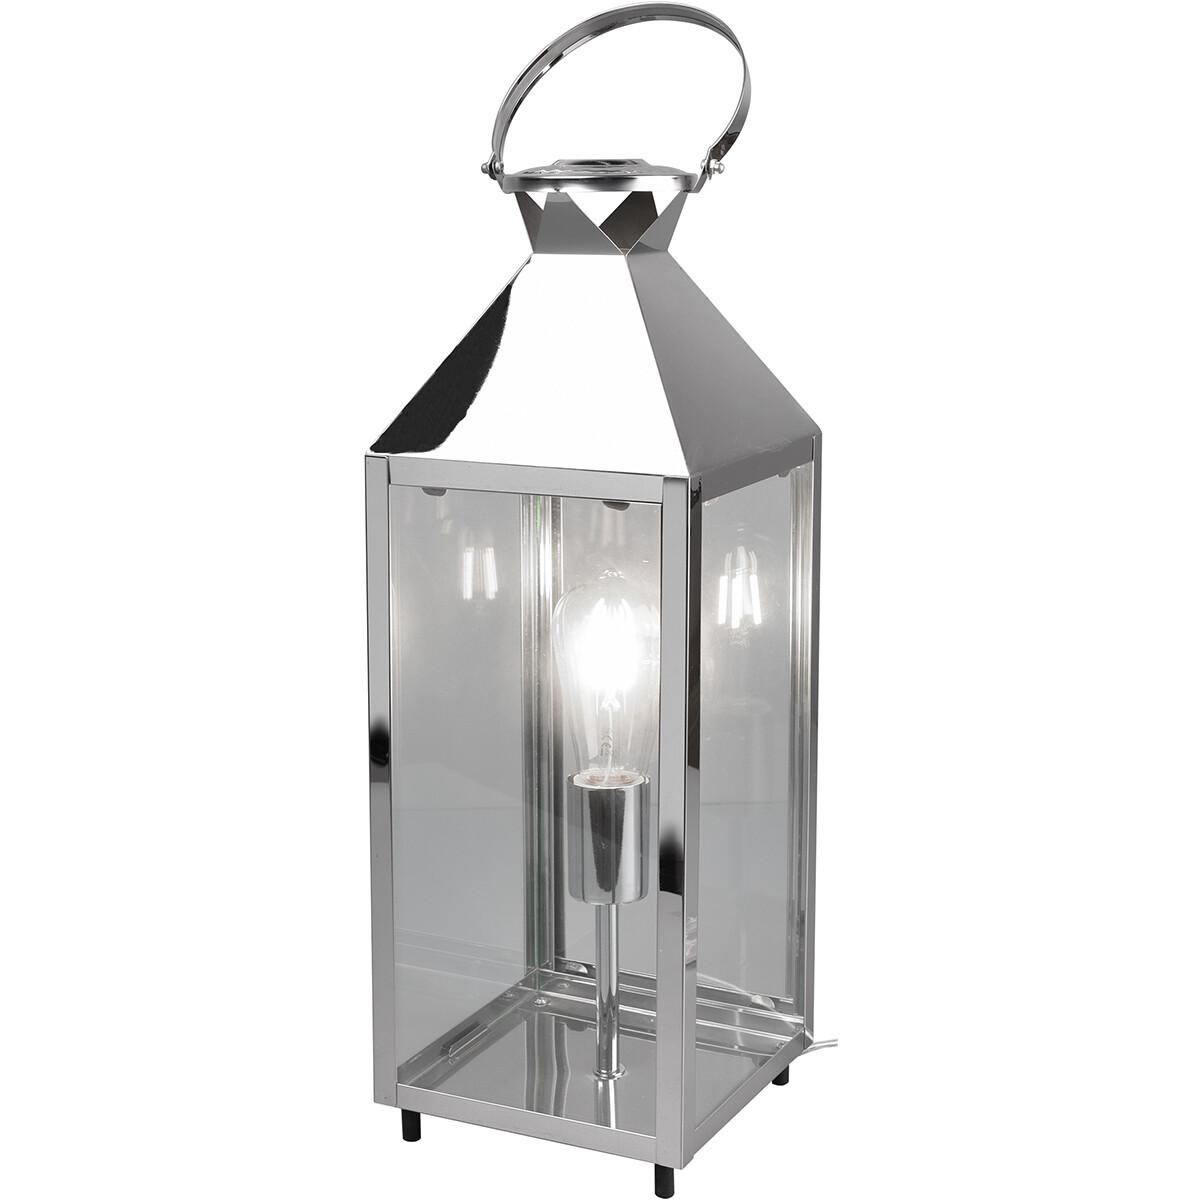 LED Tafellamp - Tafelverlichting - Trion Fala XL - E27 Fitting - Rechthoek - Mat Chroom - Aluminium